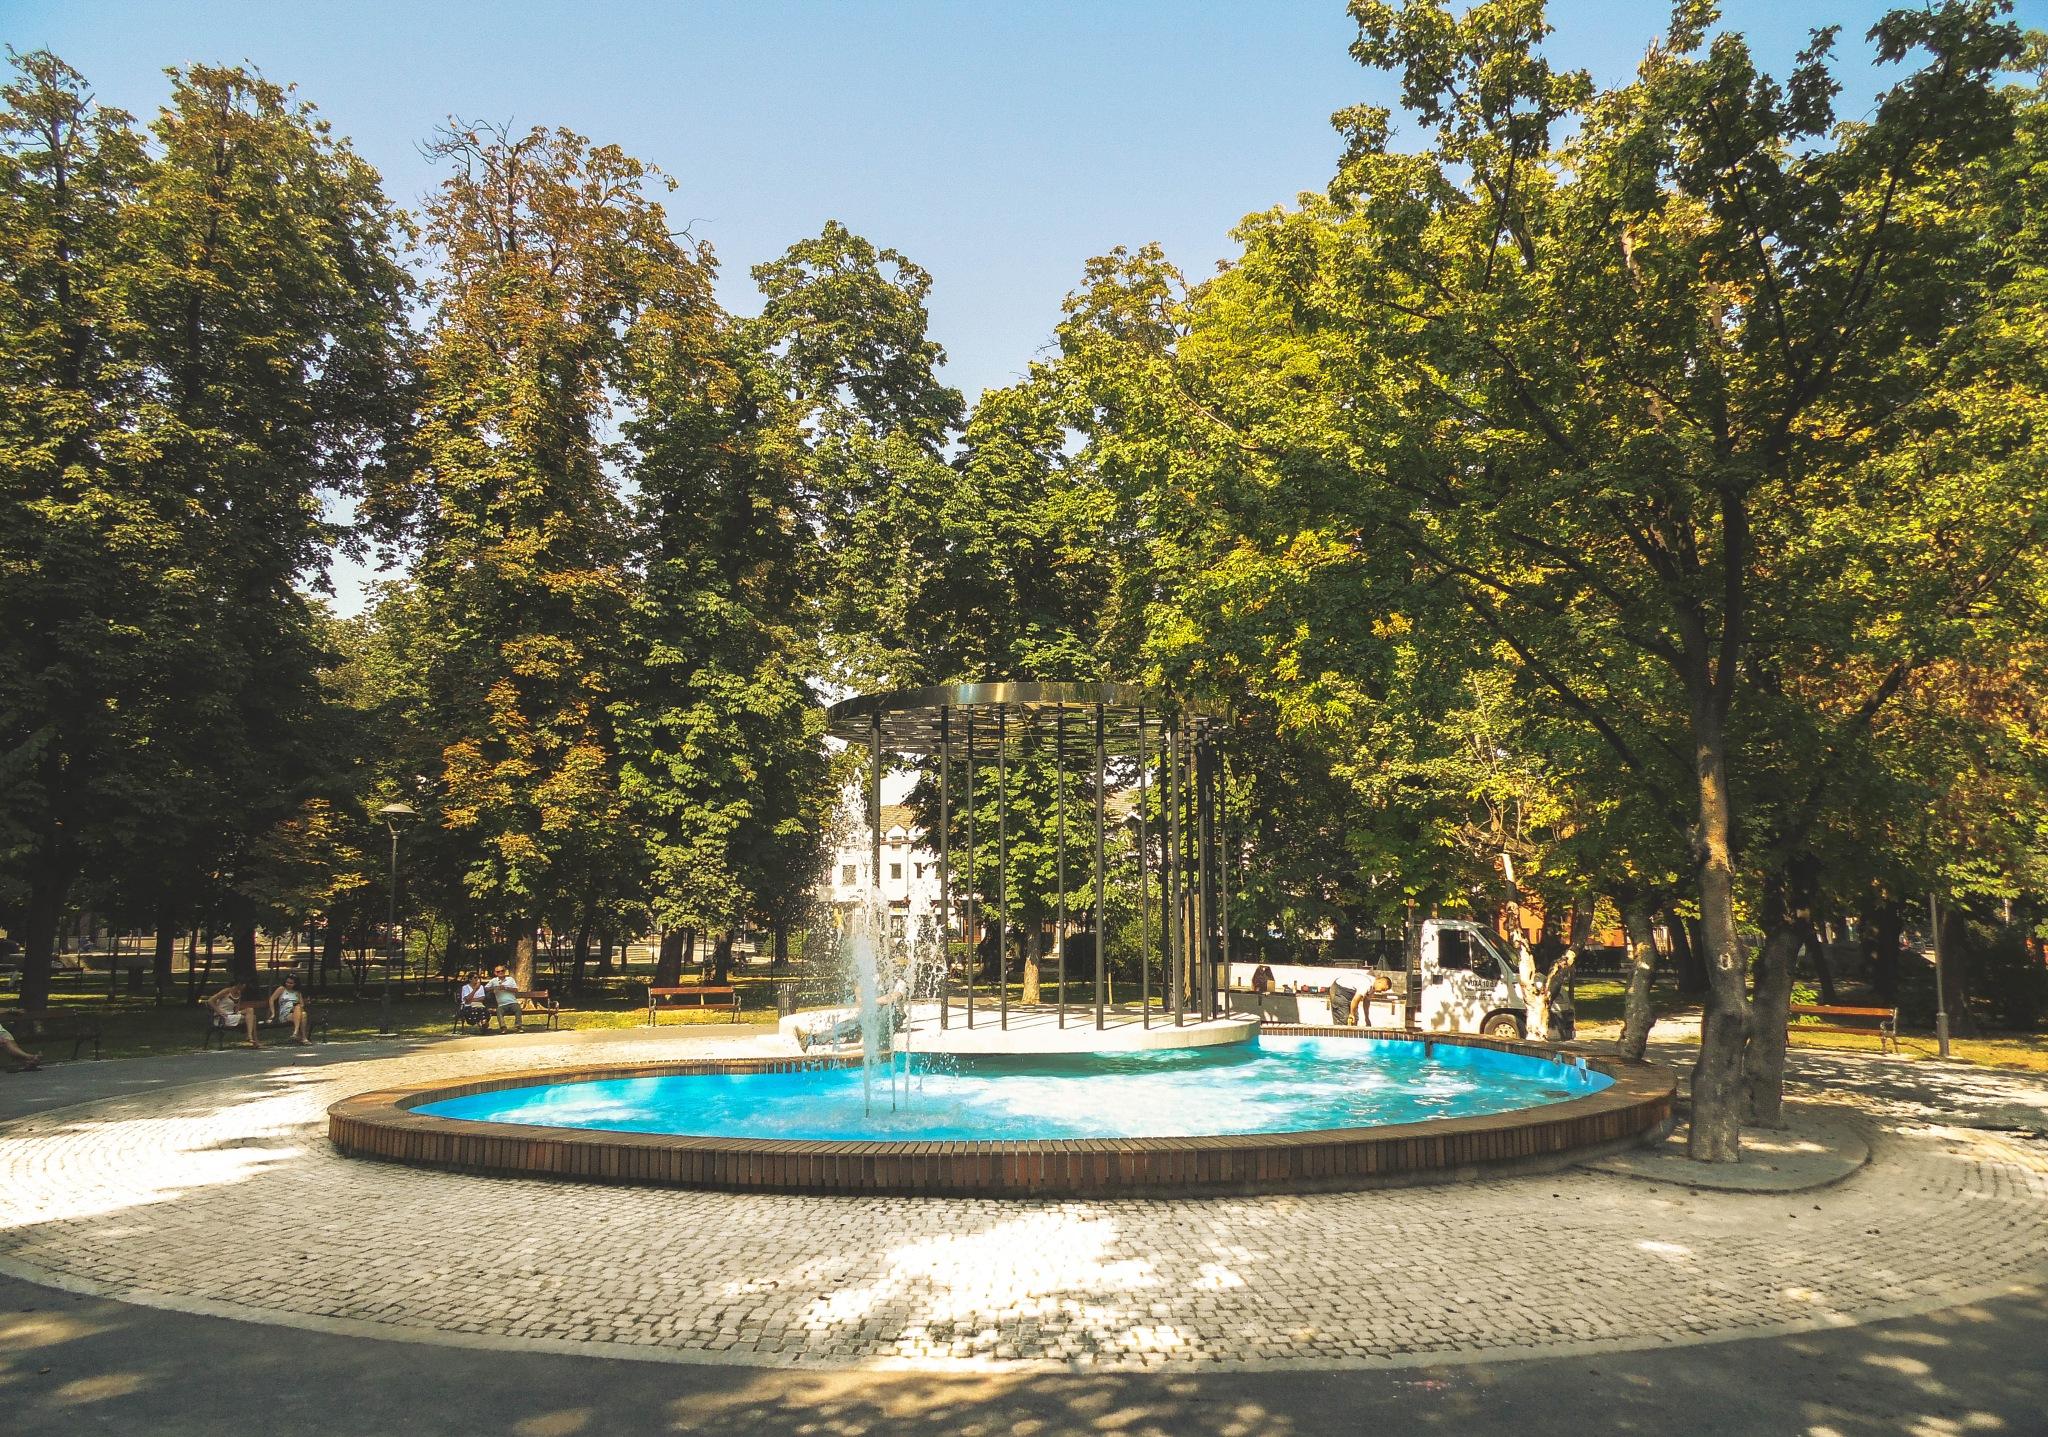 Fountain in the park by Branislav